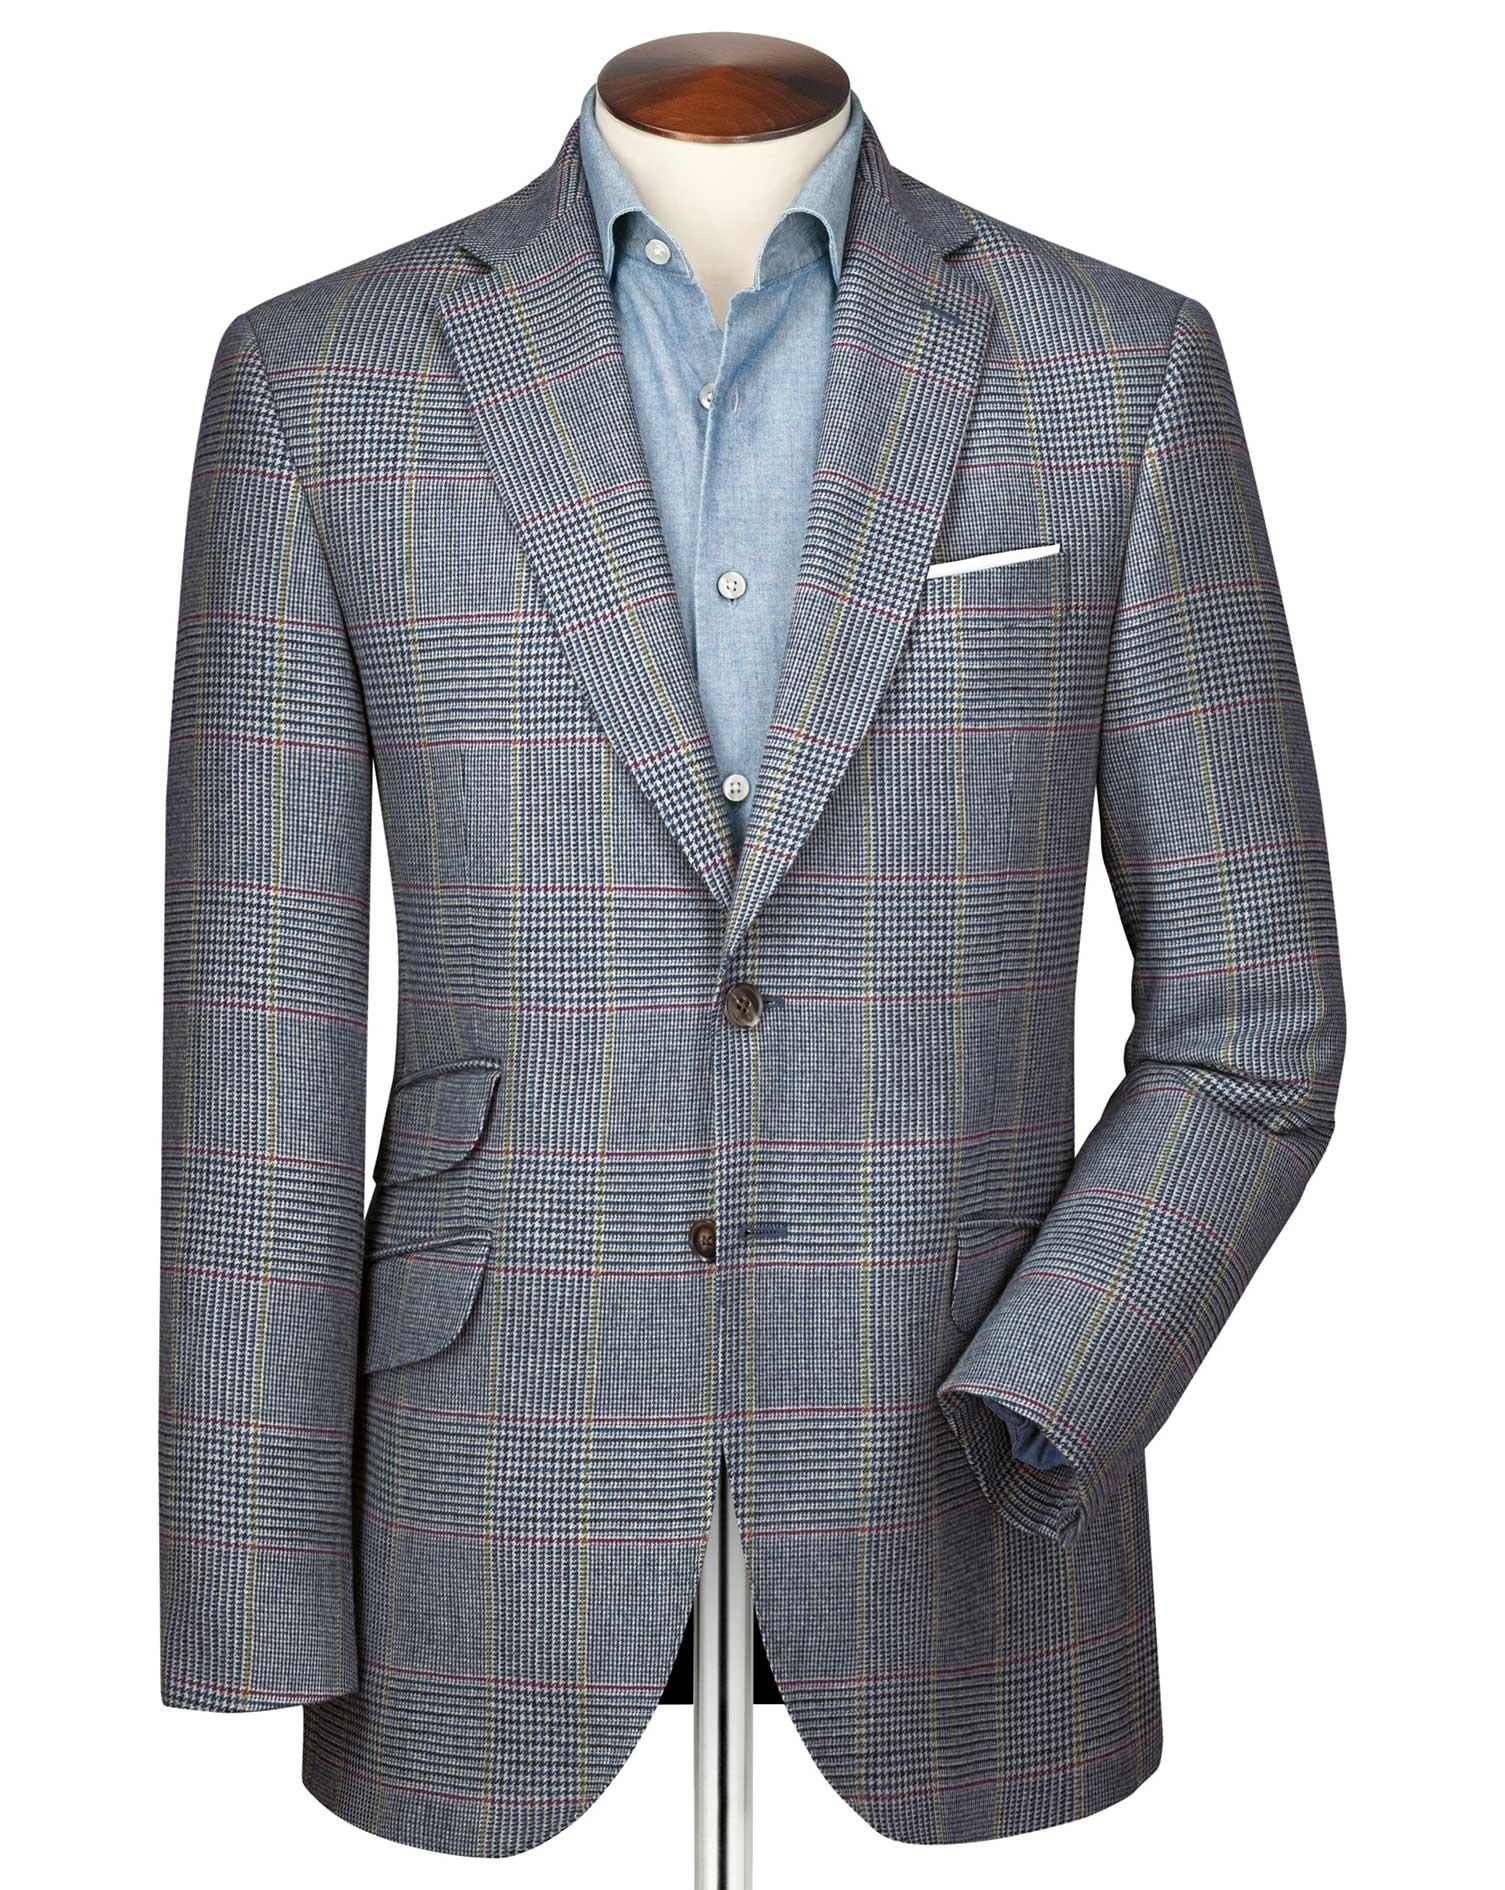 Slim Fit Blue Prince Of Wales Checkered Luxury Border Tweed Wool Jacket Size 36 Regular by Charles T